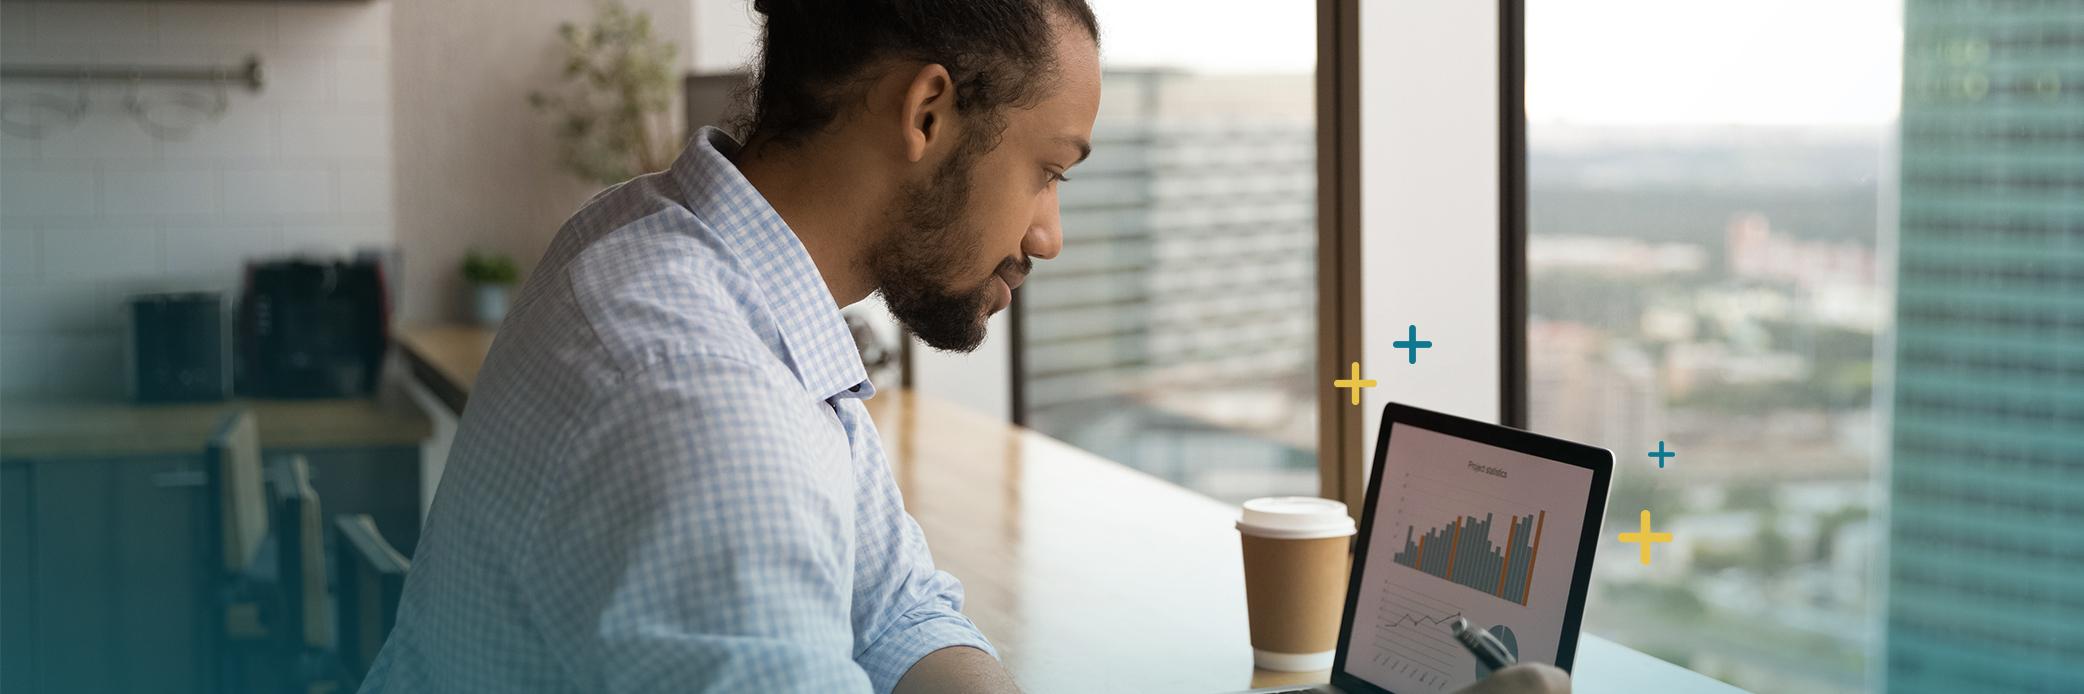 4 Ways to Improve Adoption of Your Digital Education Program